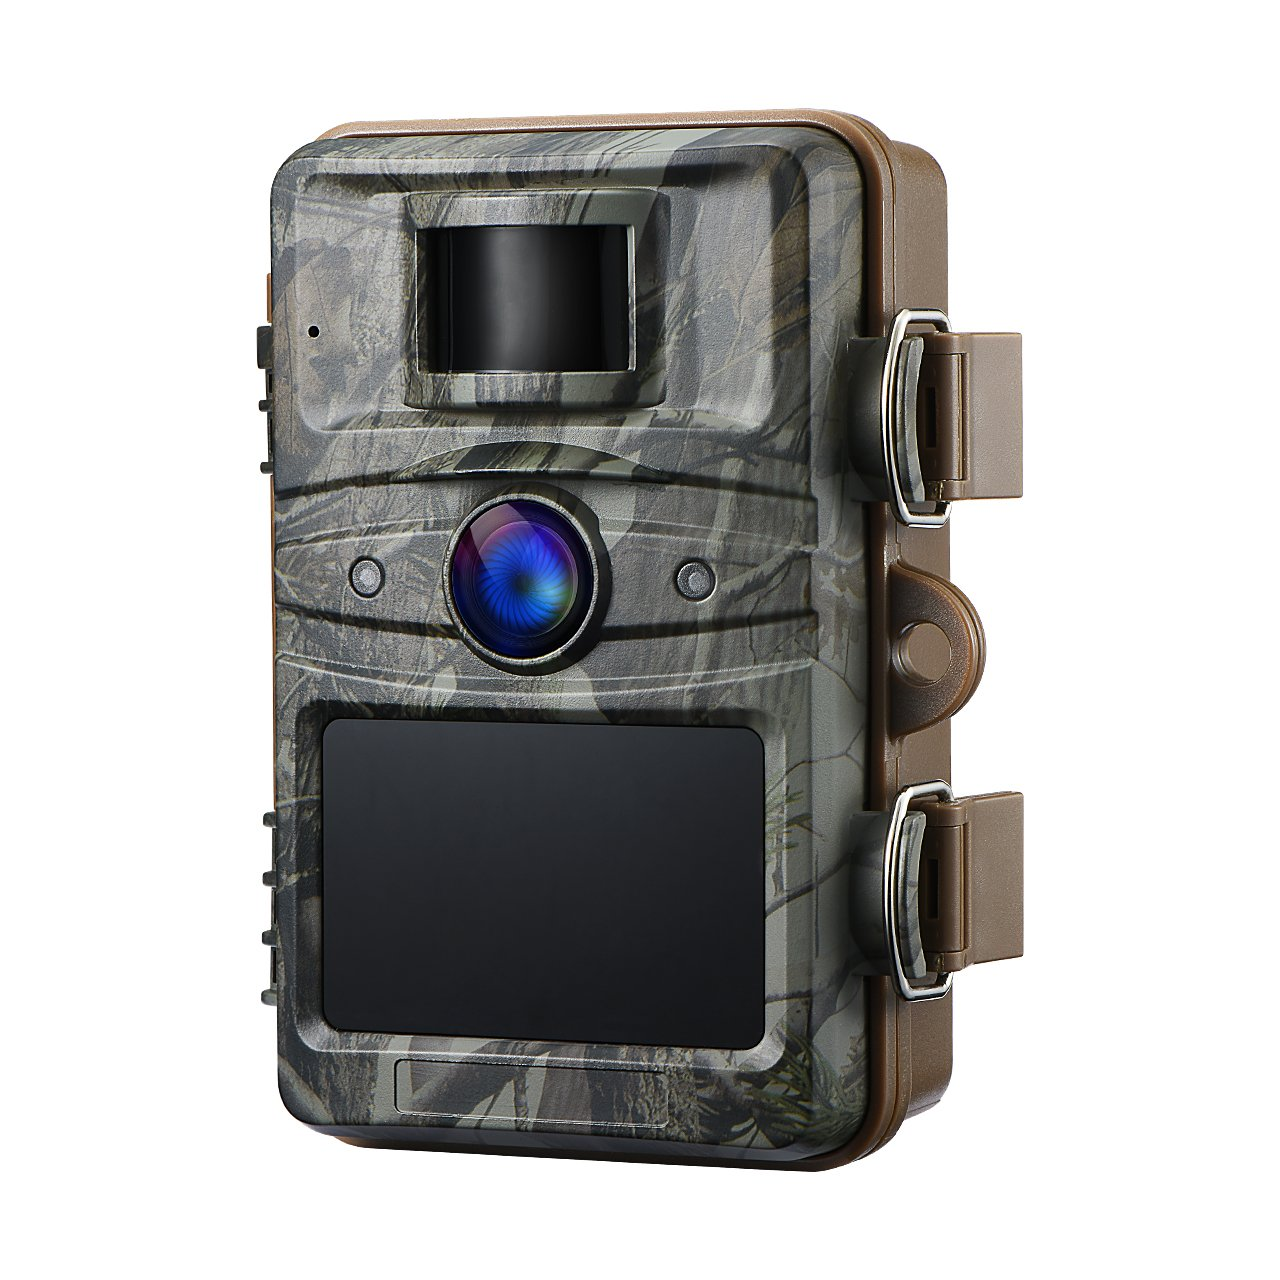 Qtuo 防犯カメラ トレイルカメラ 野外監視カメラ 暗視カメラ 1080P撮影 30FPSビデオ 12MP解像度 低光赤外線技術 2.4LED搭載 自動検知 高感度CMOSセンサ IPX6防水 防塵 低光赤外線 日本語説明書付き 18ヶ月保証付き B076ZLRF85